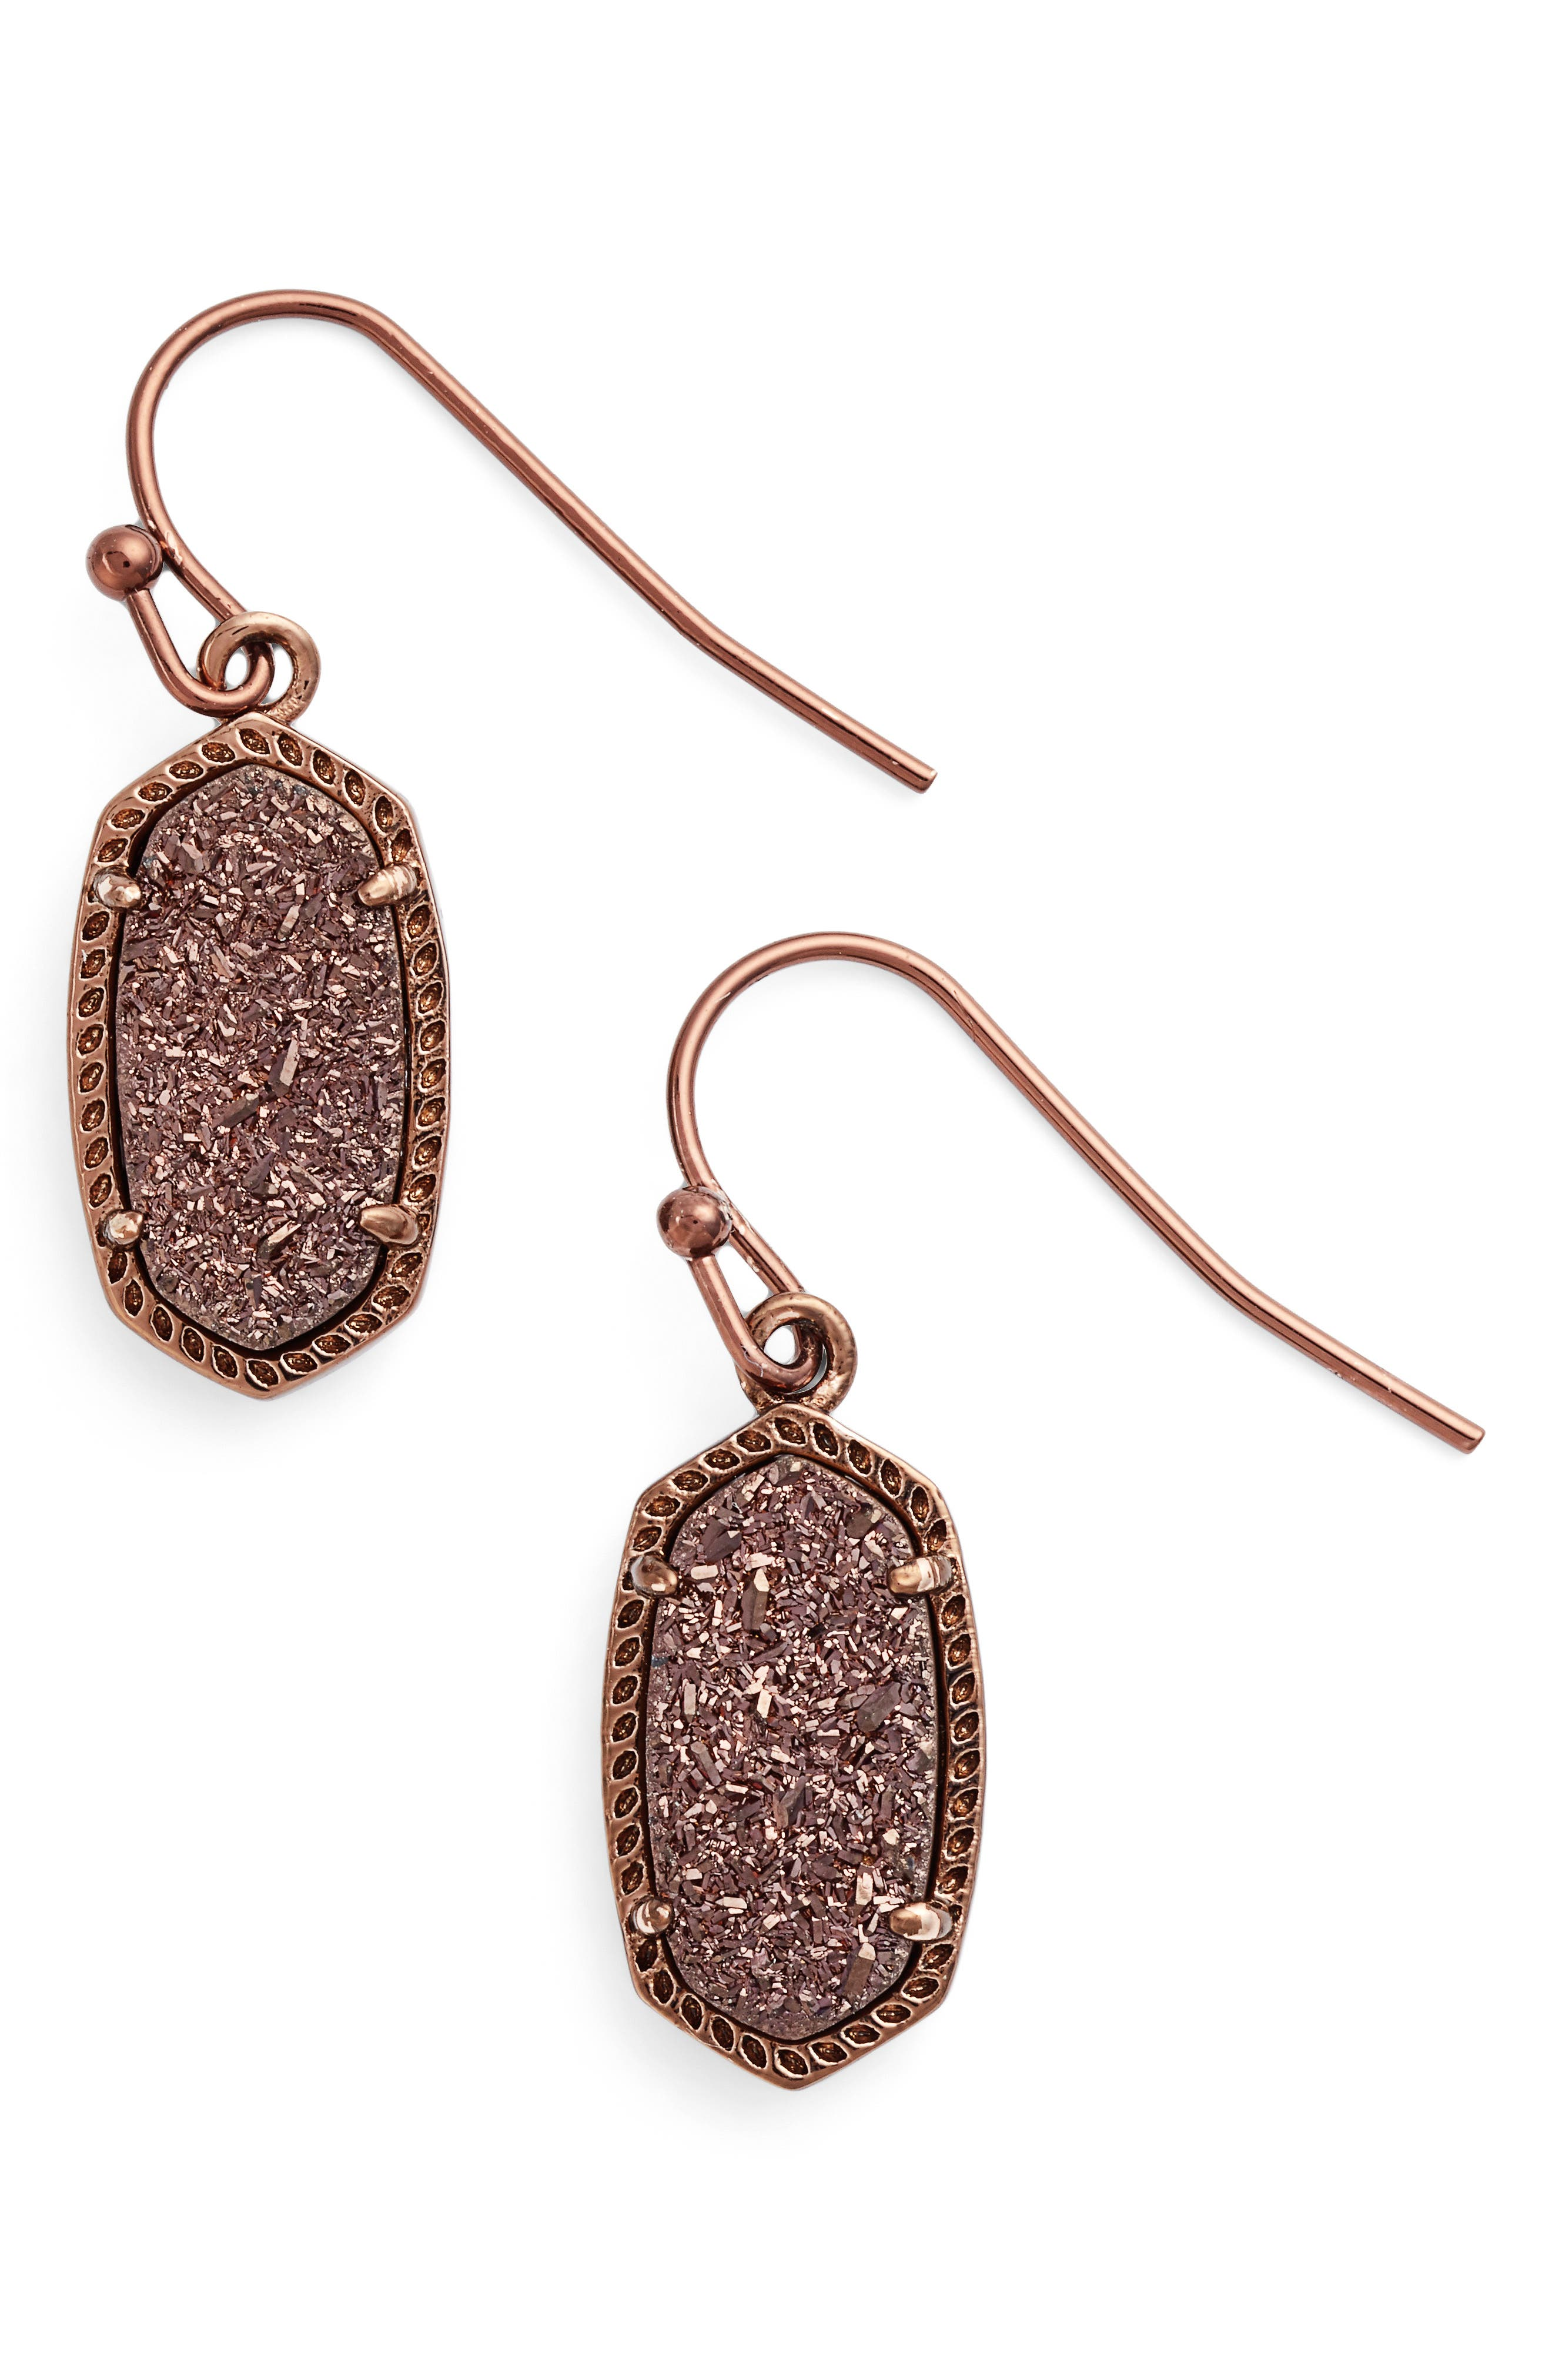 Main Image - Kendra Scott 'Lee' Small Drop Earrings